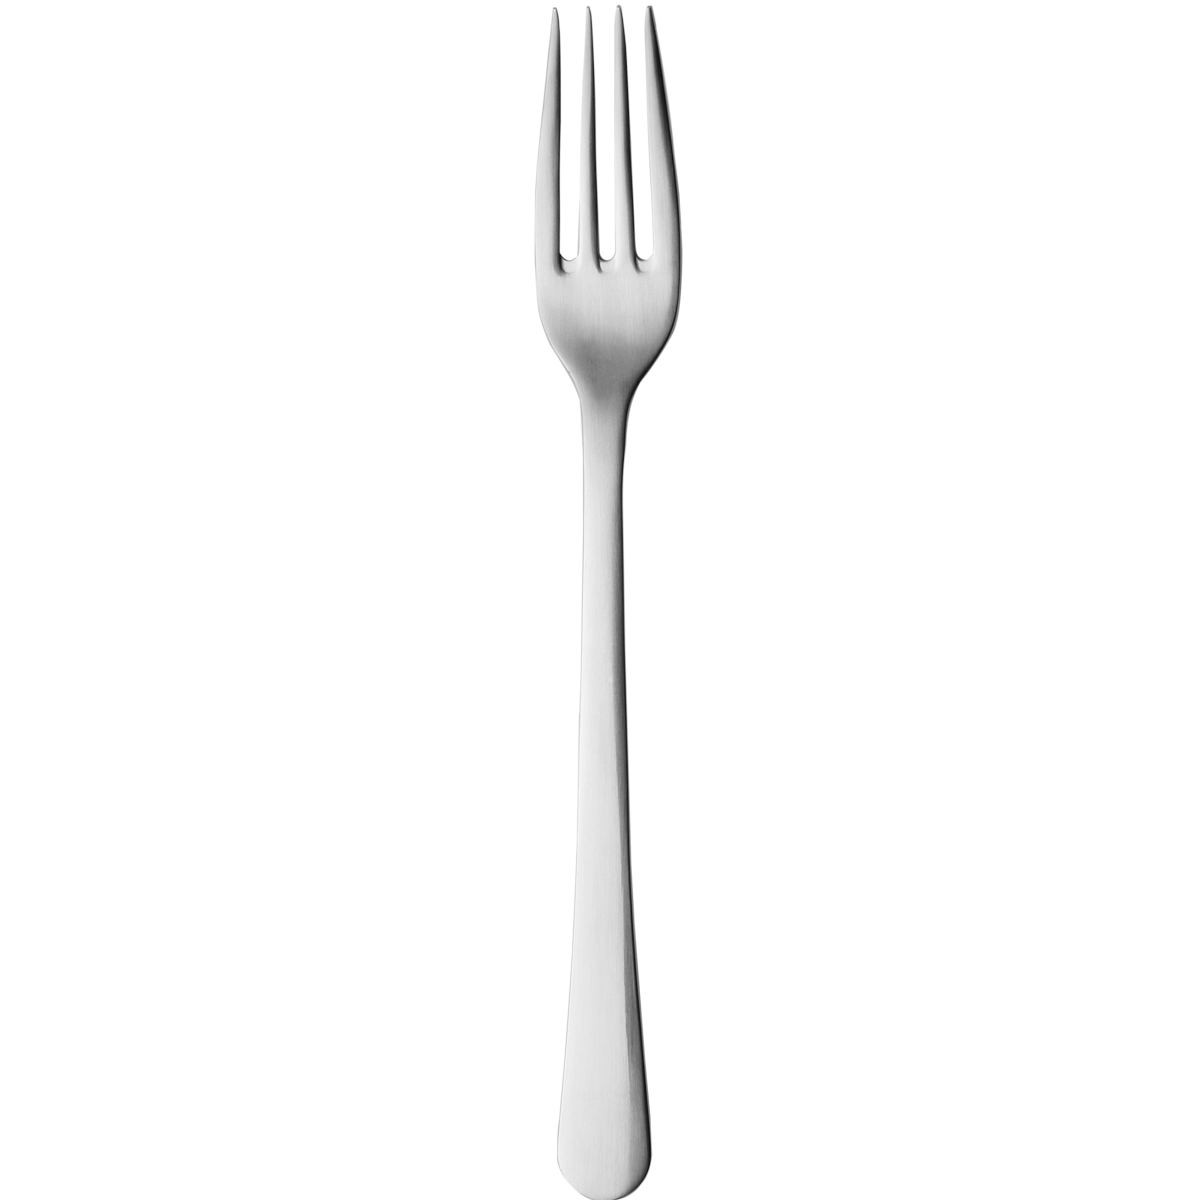 Fork Clipart.